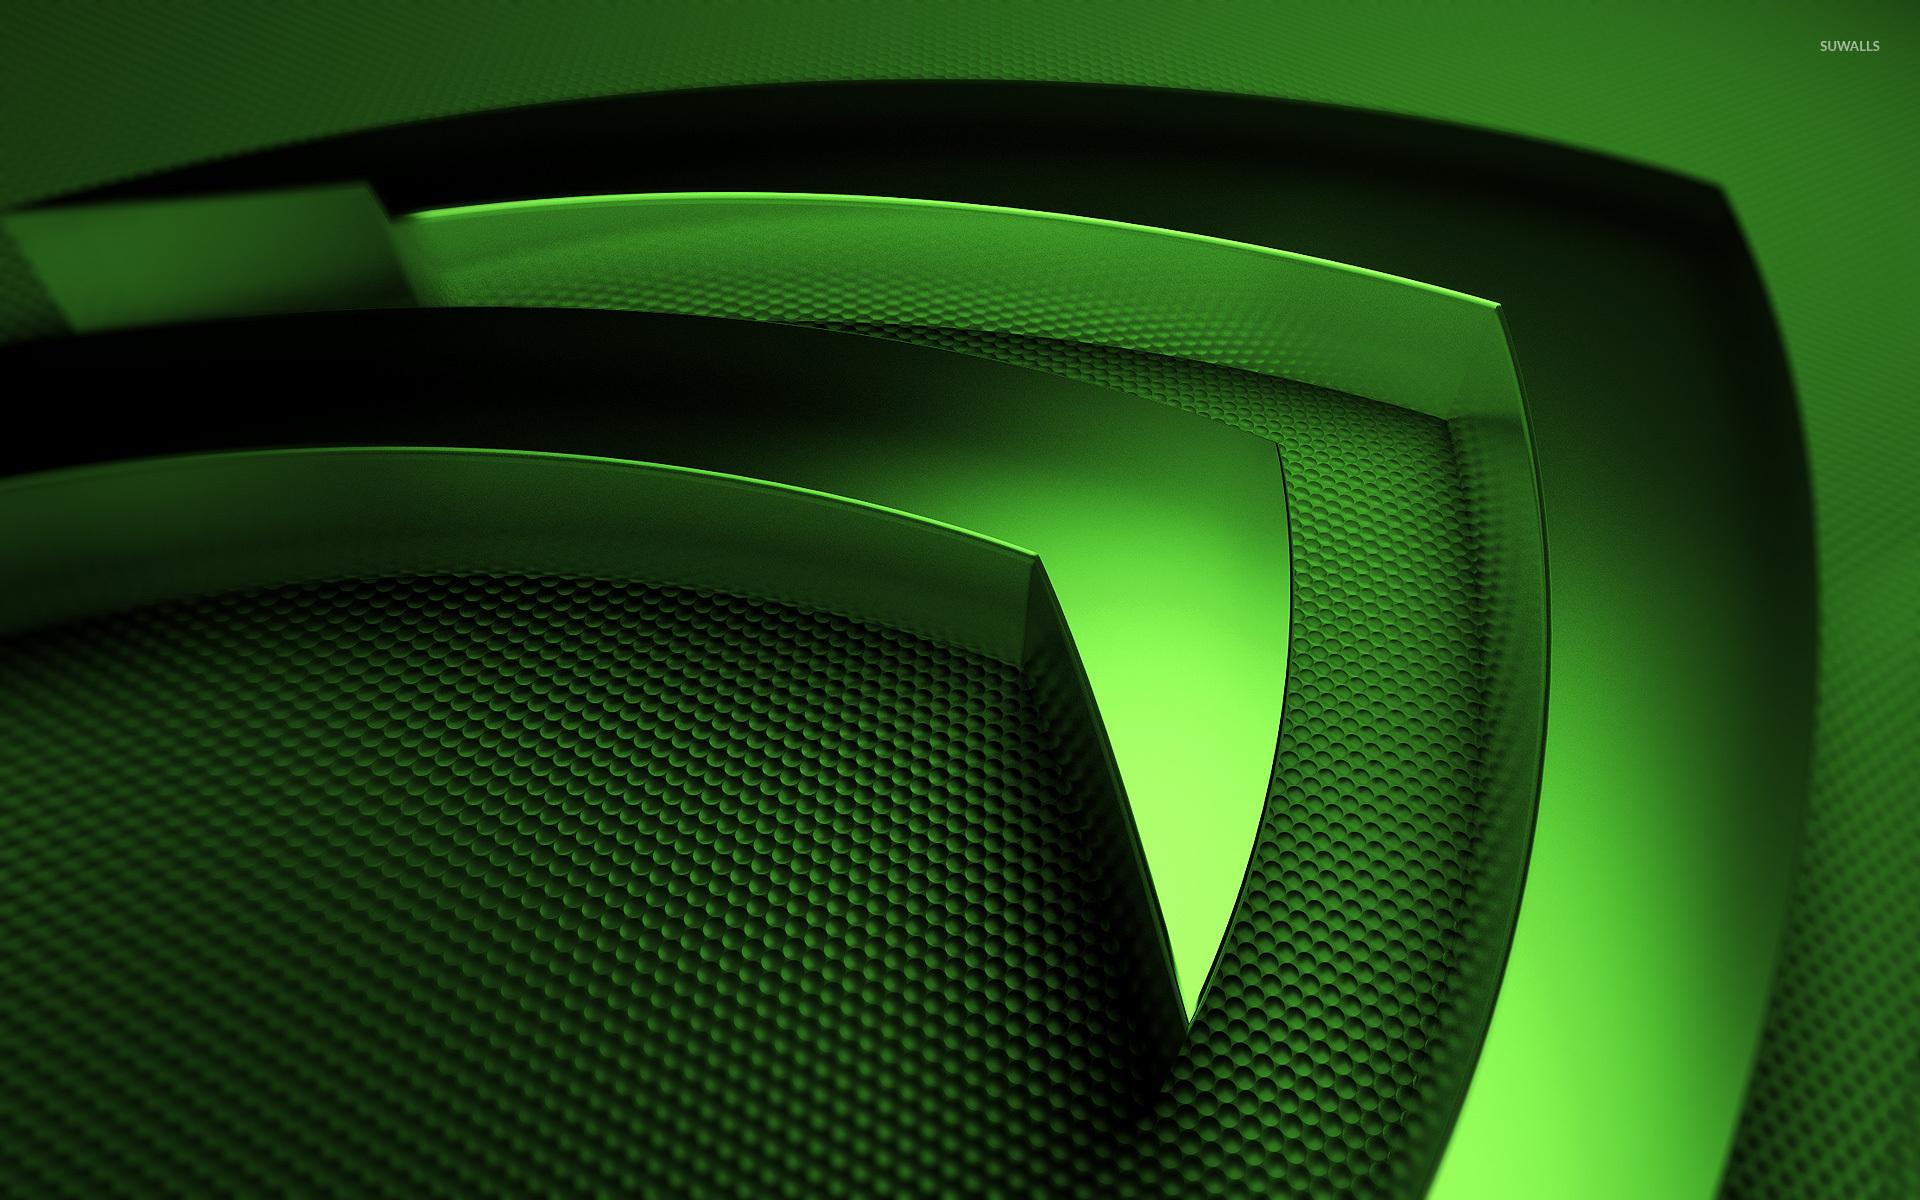 1920x1200 windows vista green - photo #27